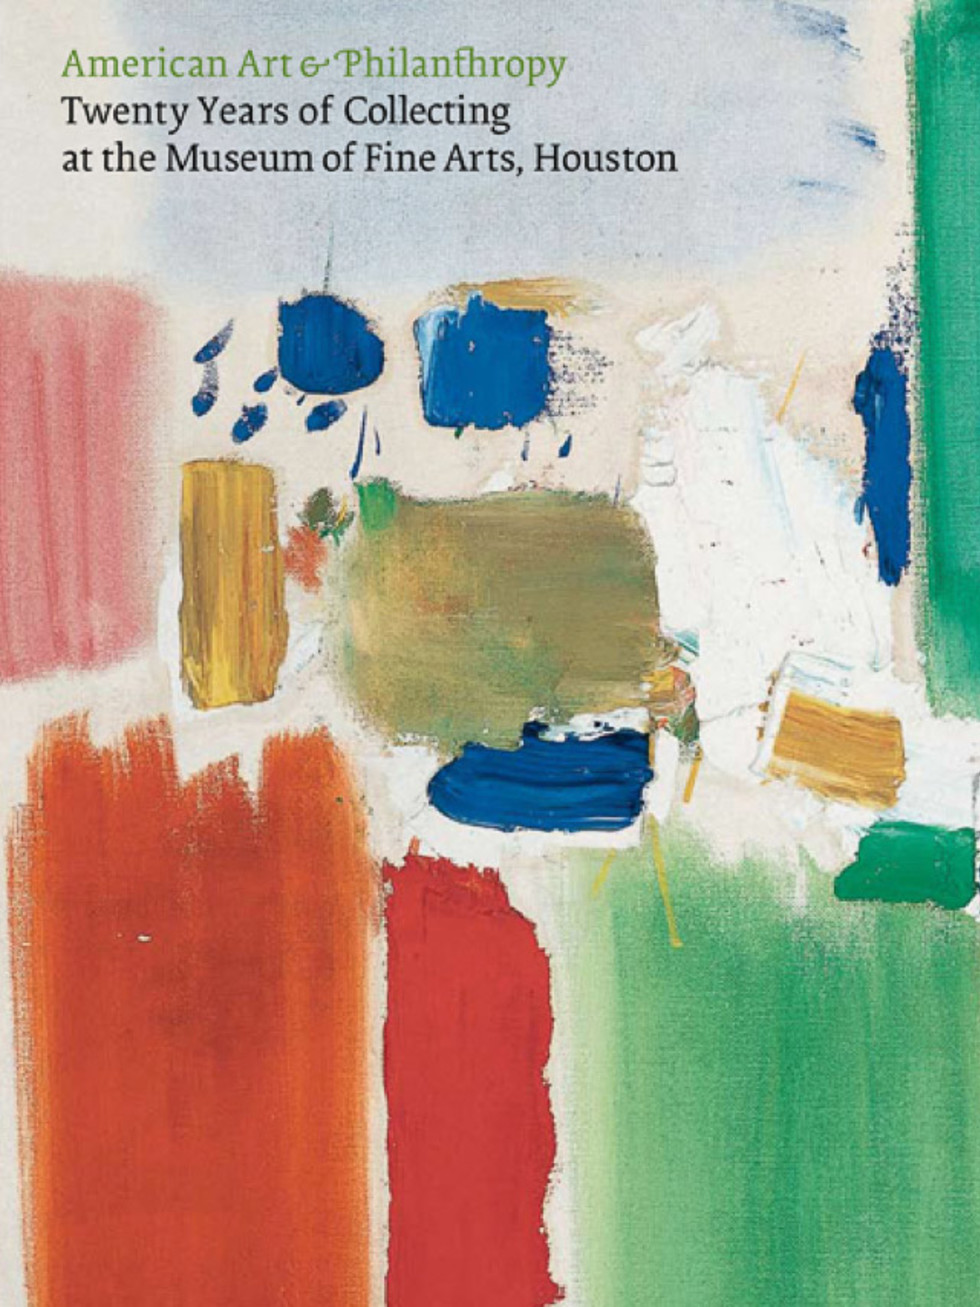 News_Peter Marzio_American Art and Philanthropy